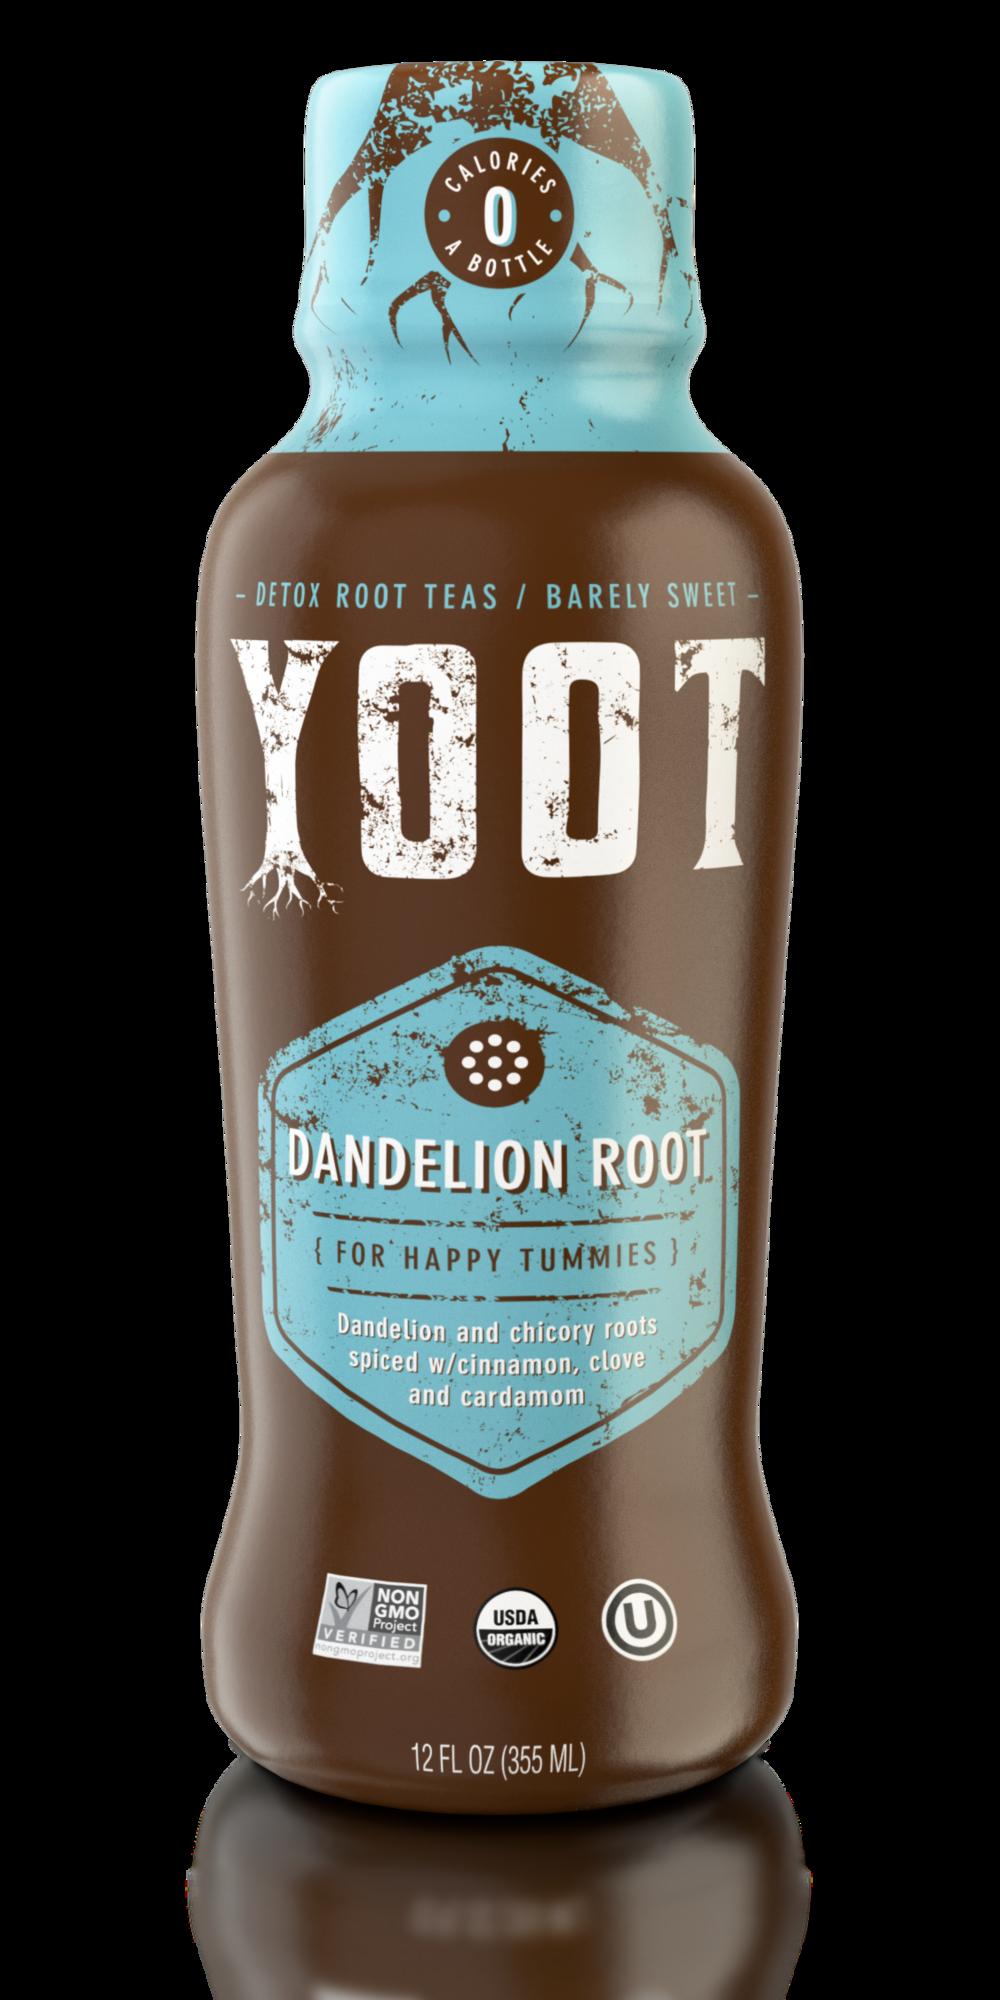 Yoot Dandelion Root